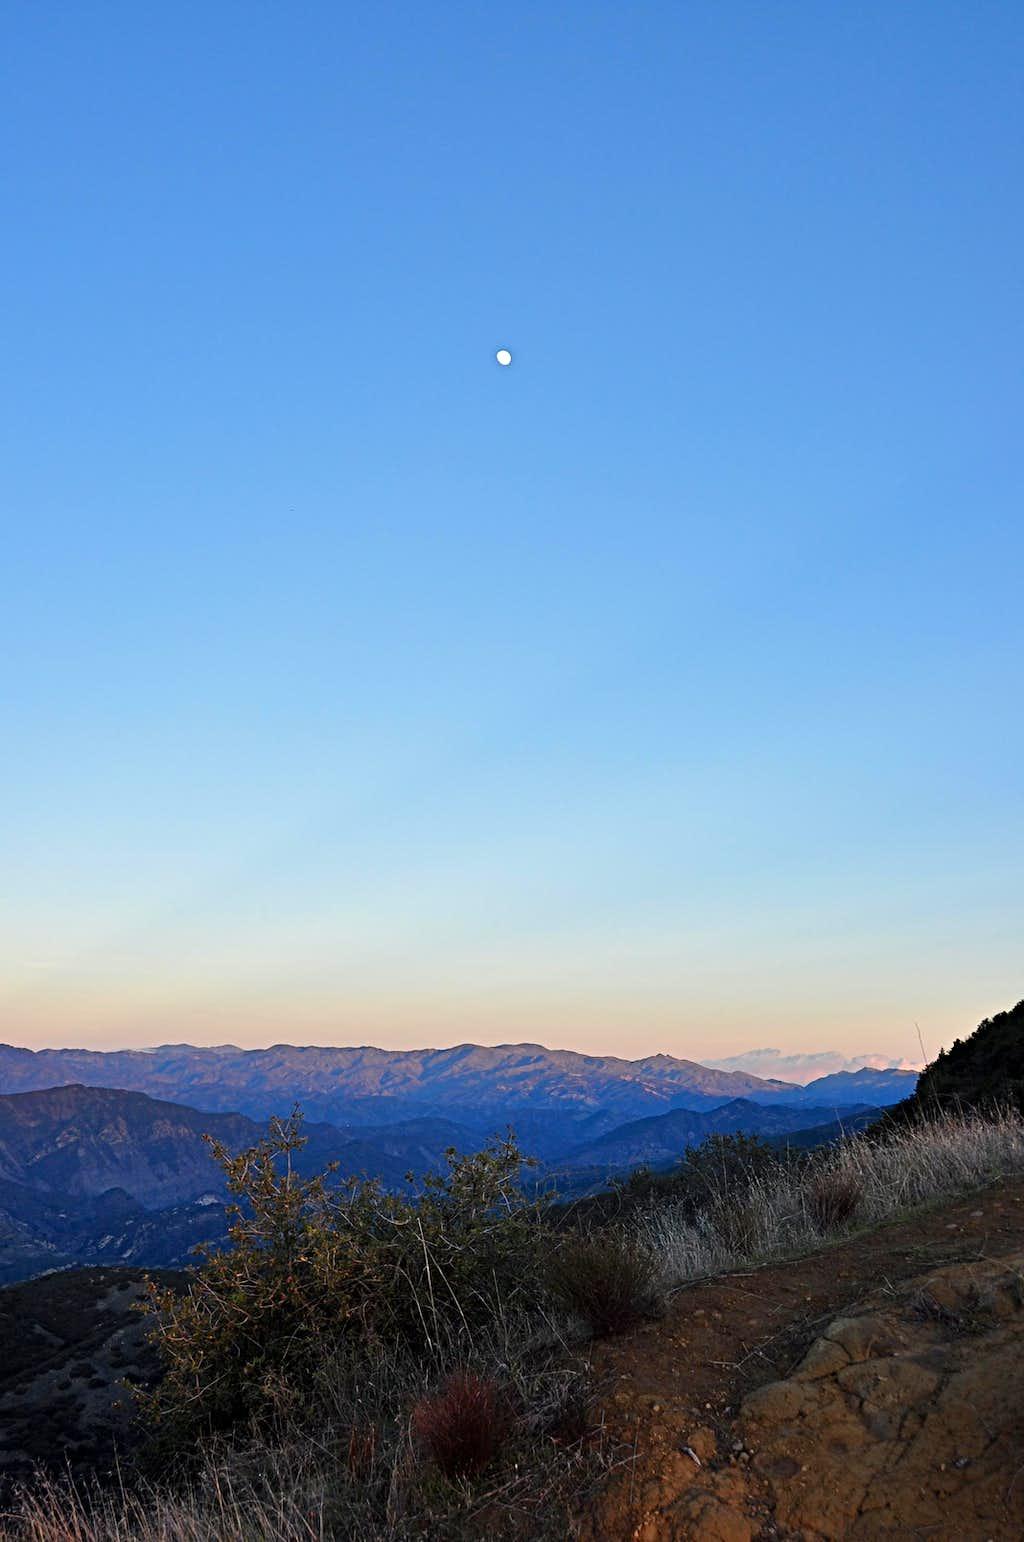 Looking north from Camino Cielo Ridge